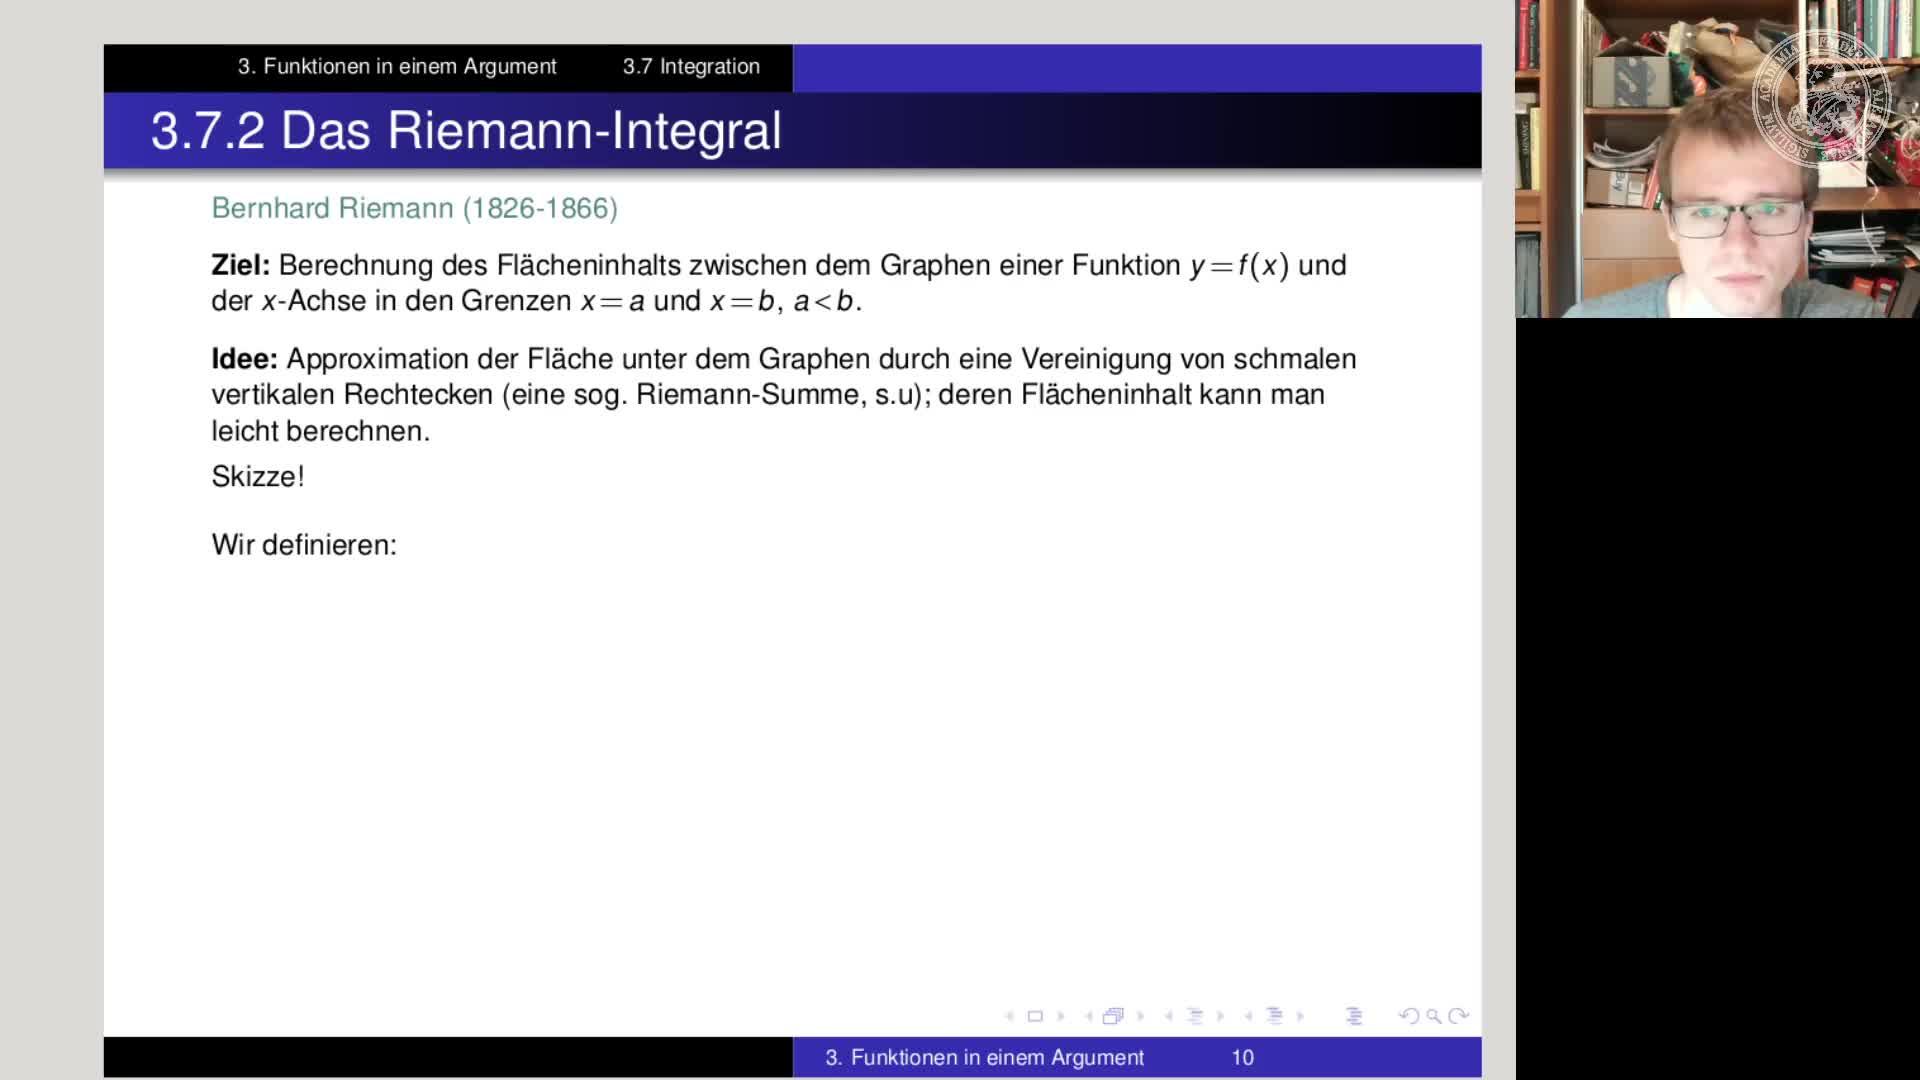 VL_09_2_Riemannintegral preview image